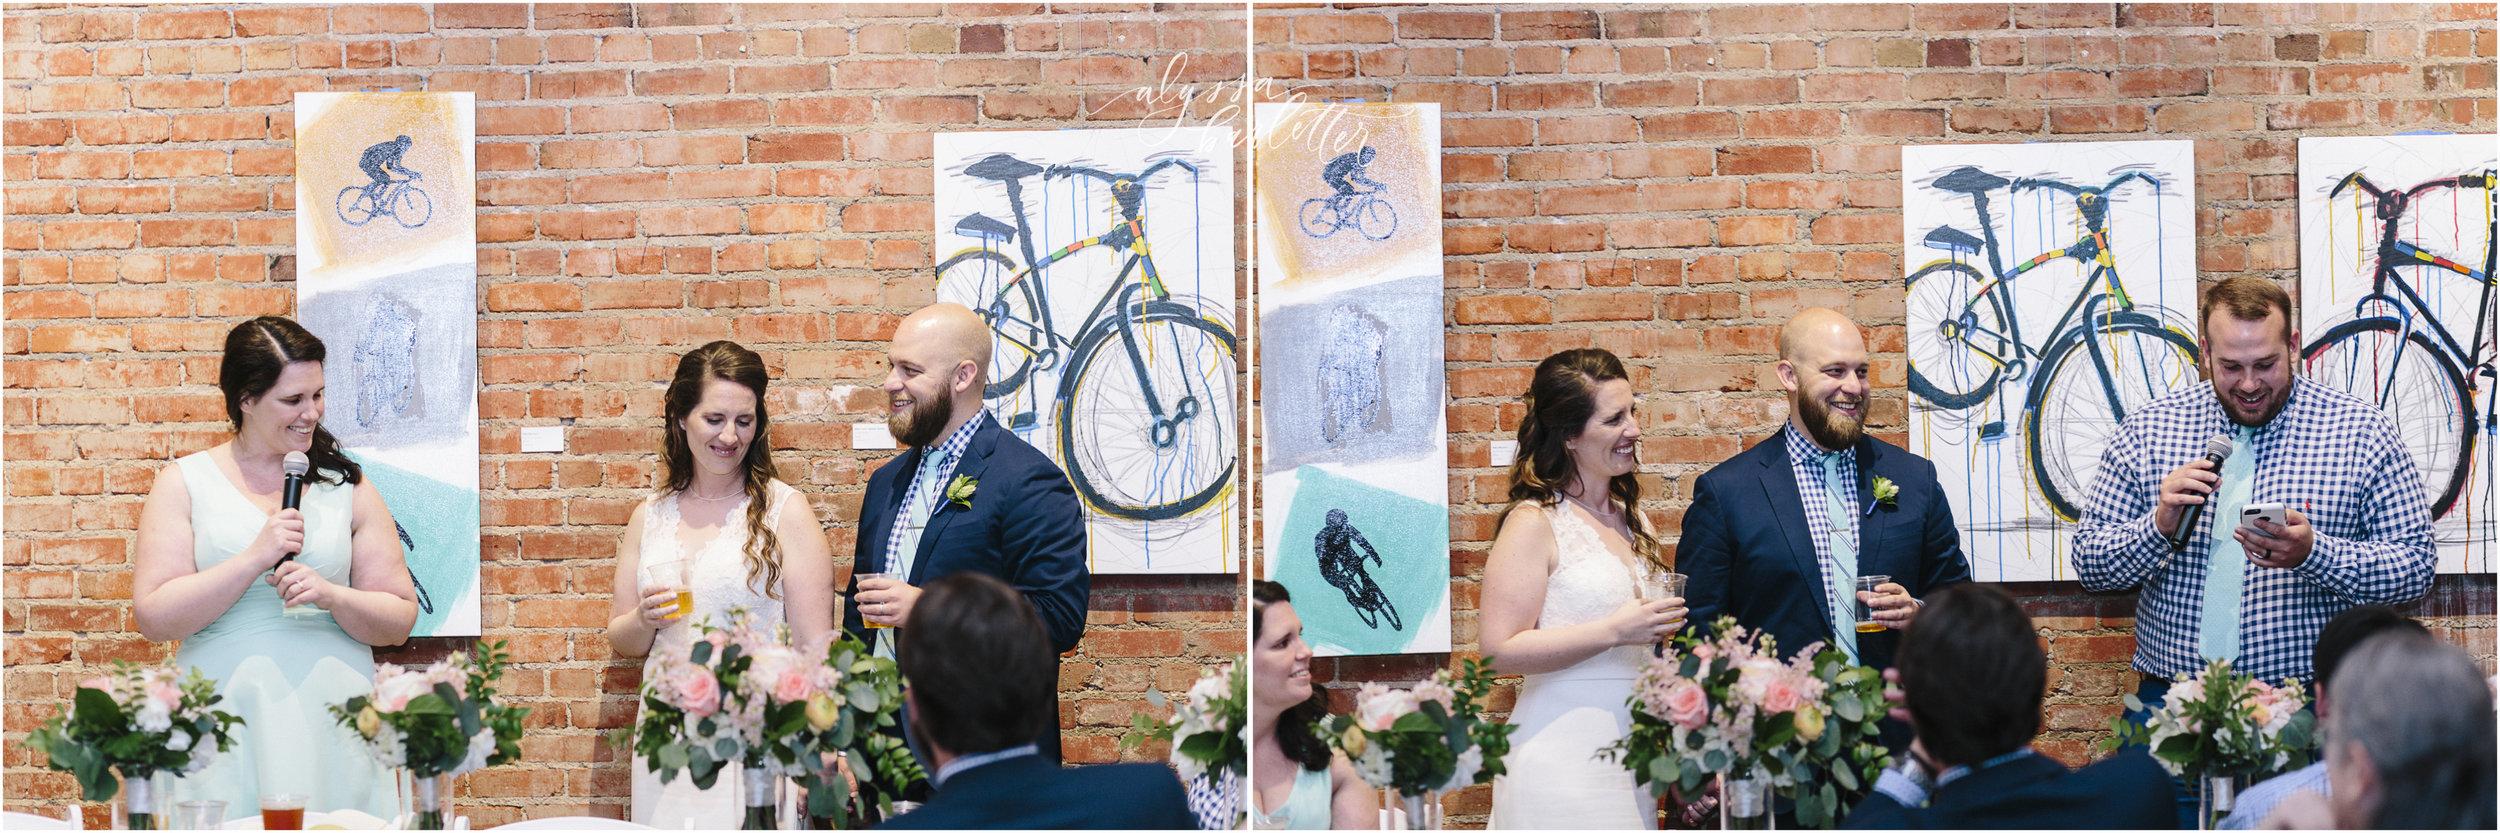 alyssa barletter photography kansas city wedding 2016 main courtney and brian-1-47.jpg